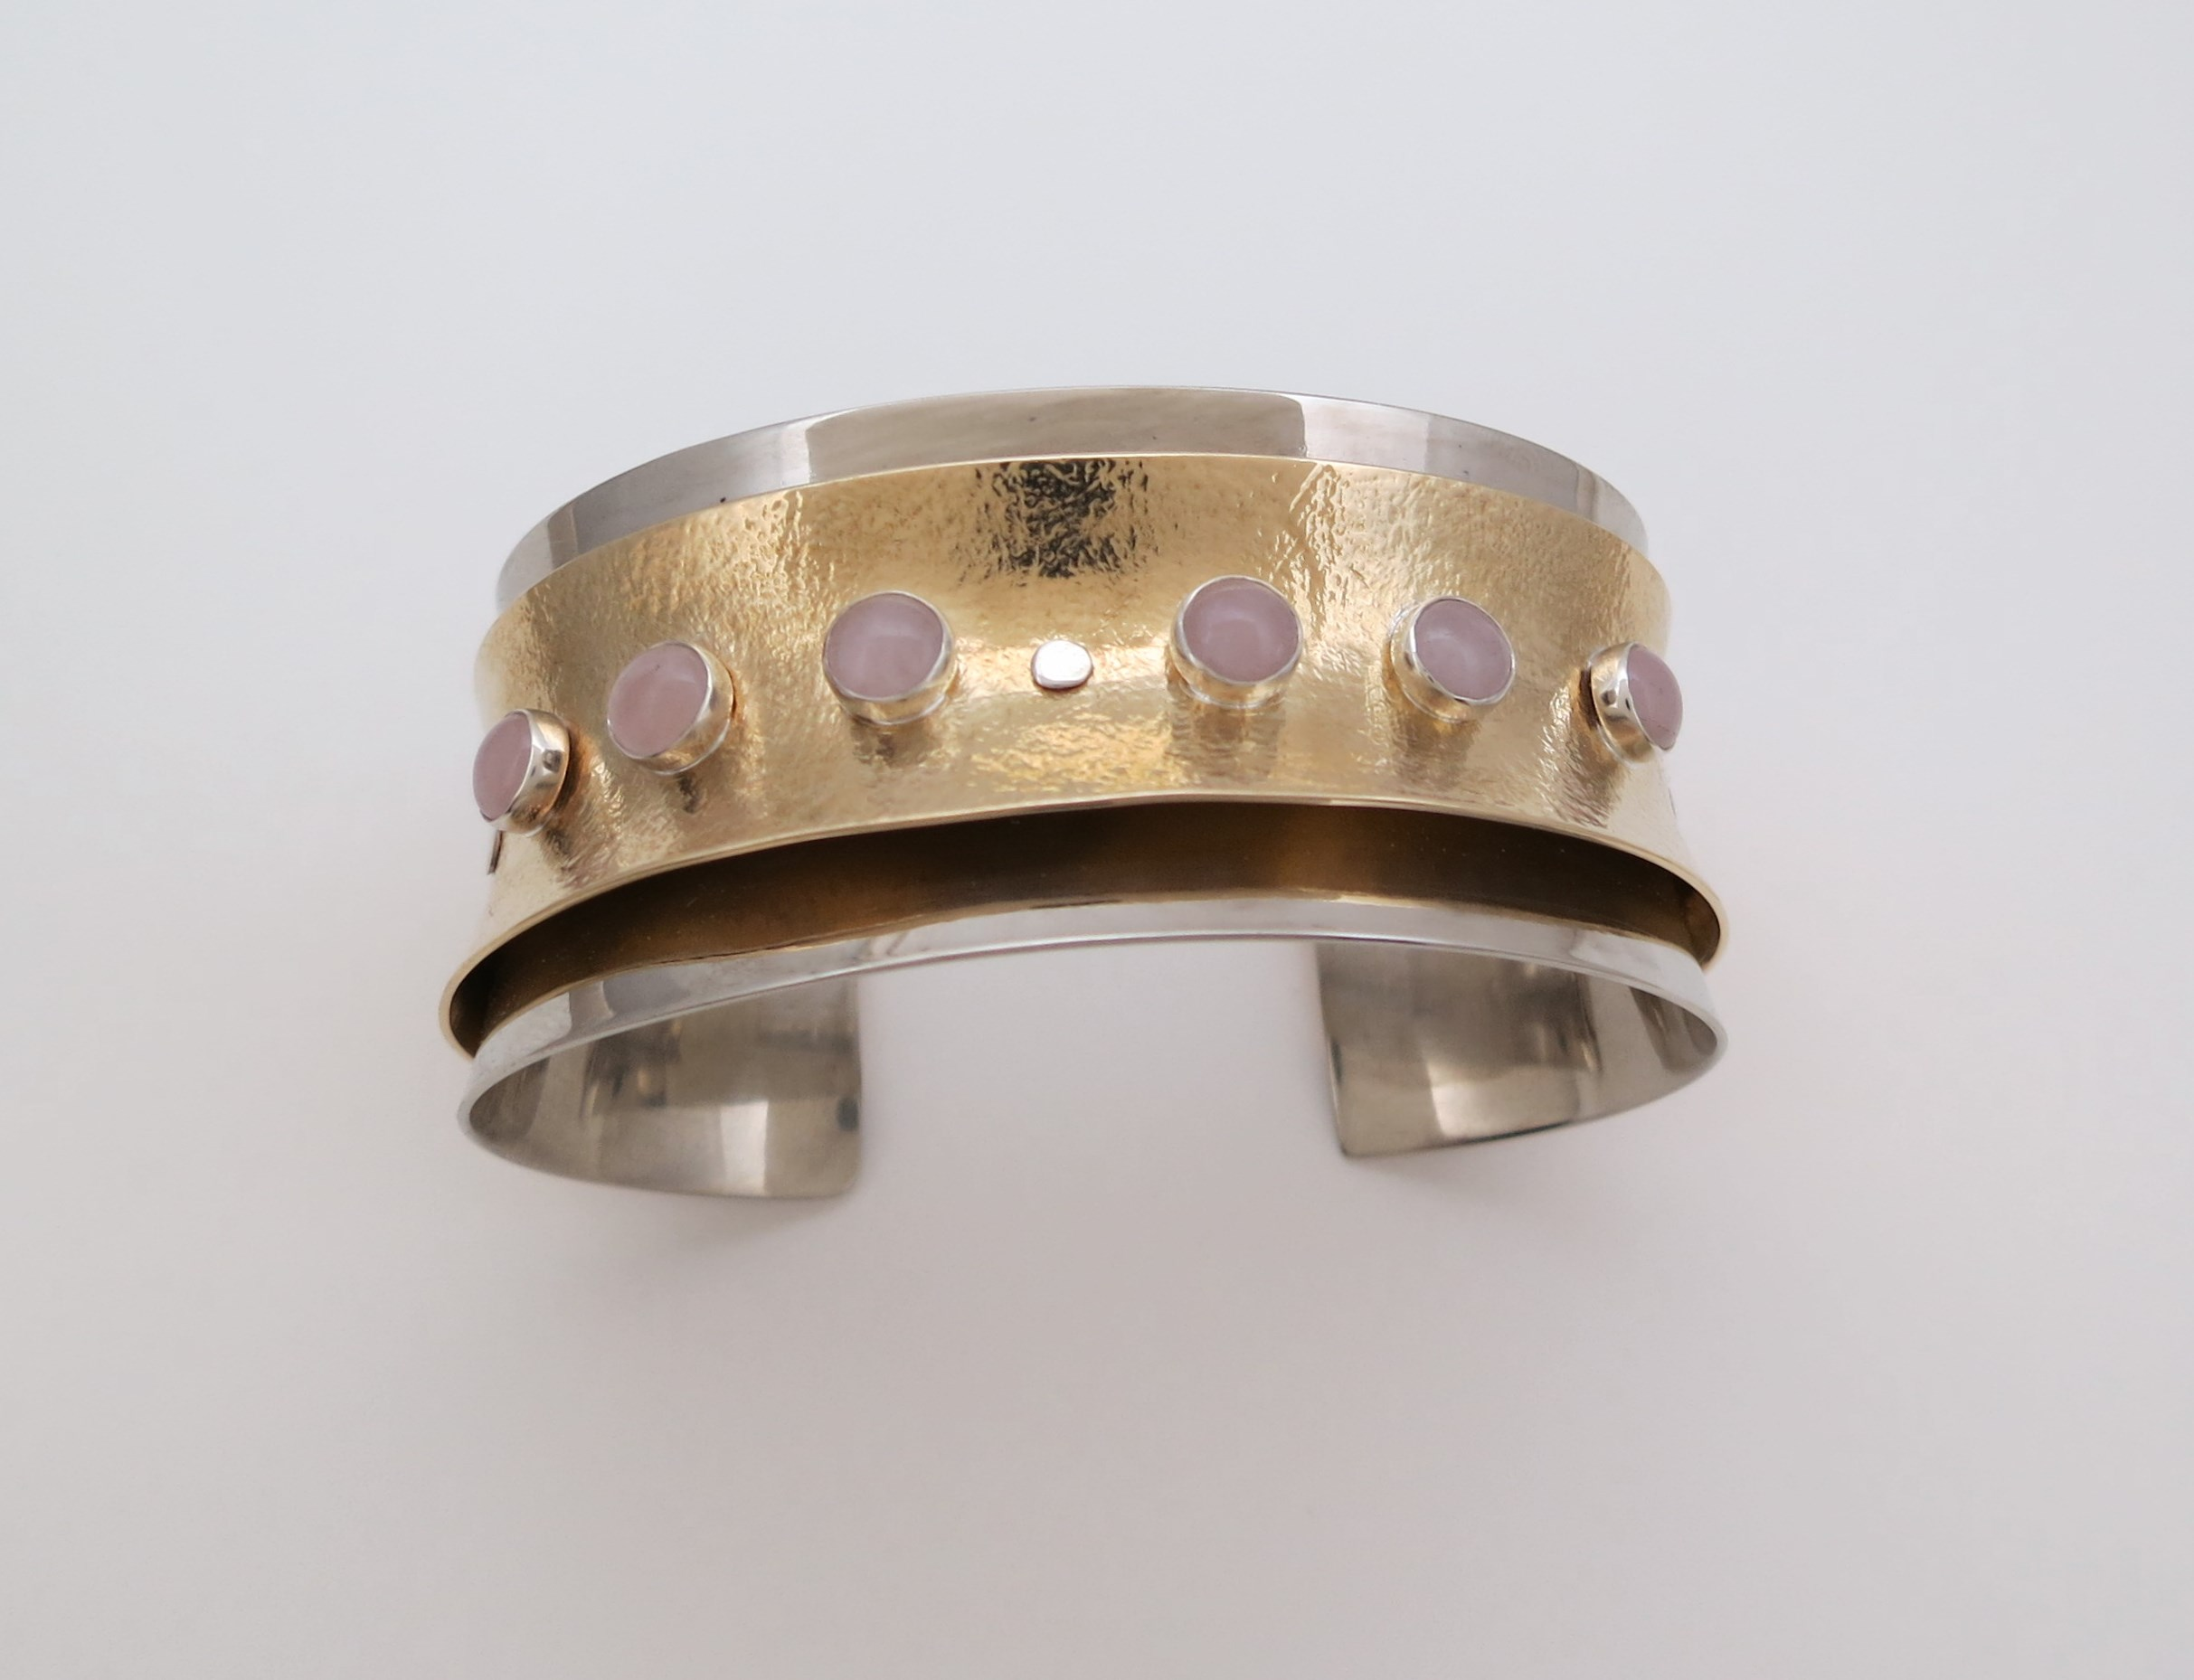 Anticlastic cuff bracelet